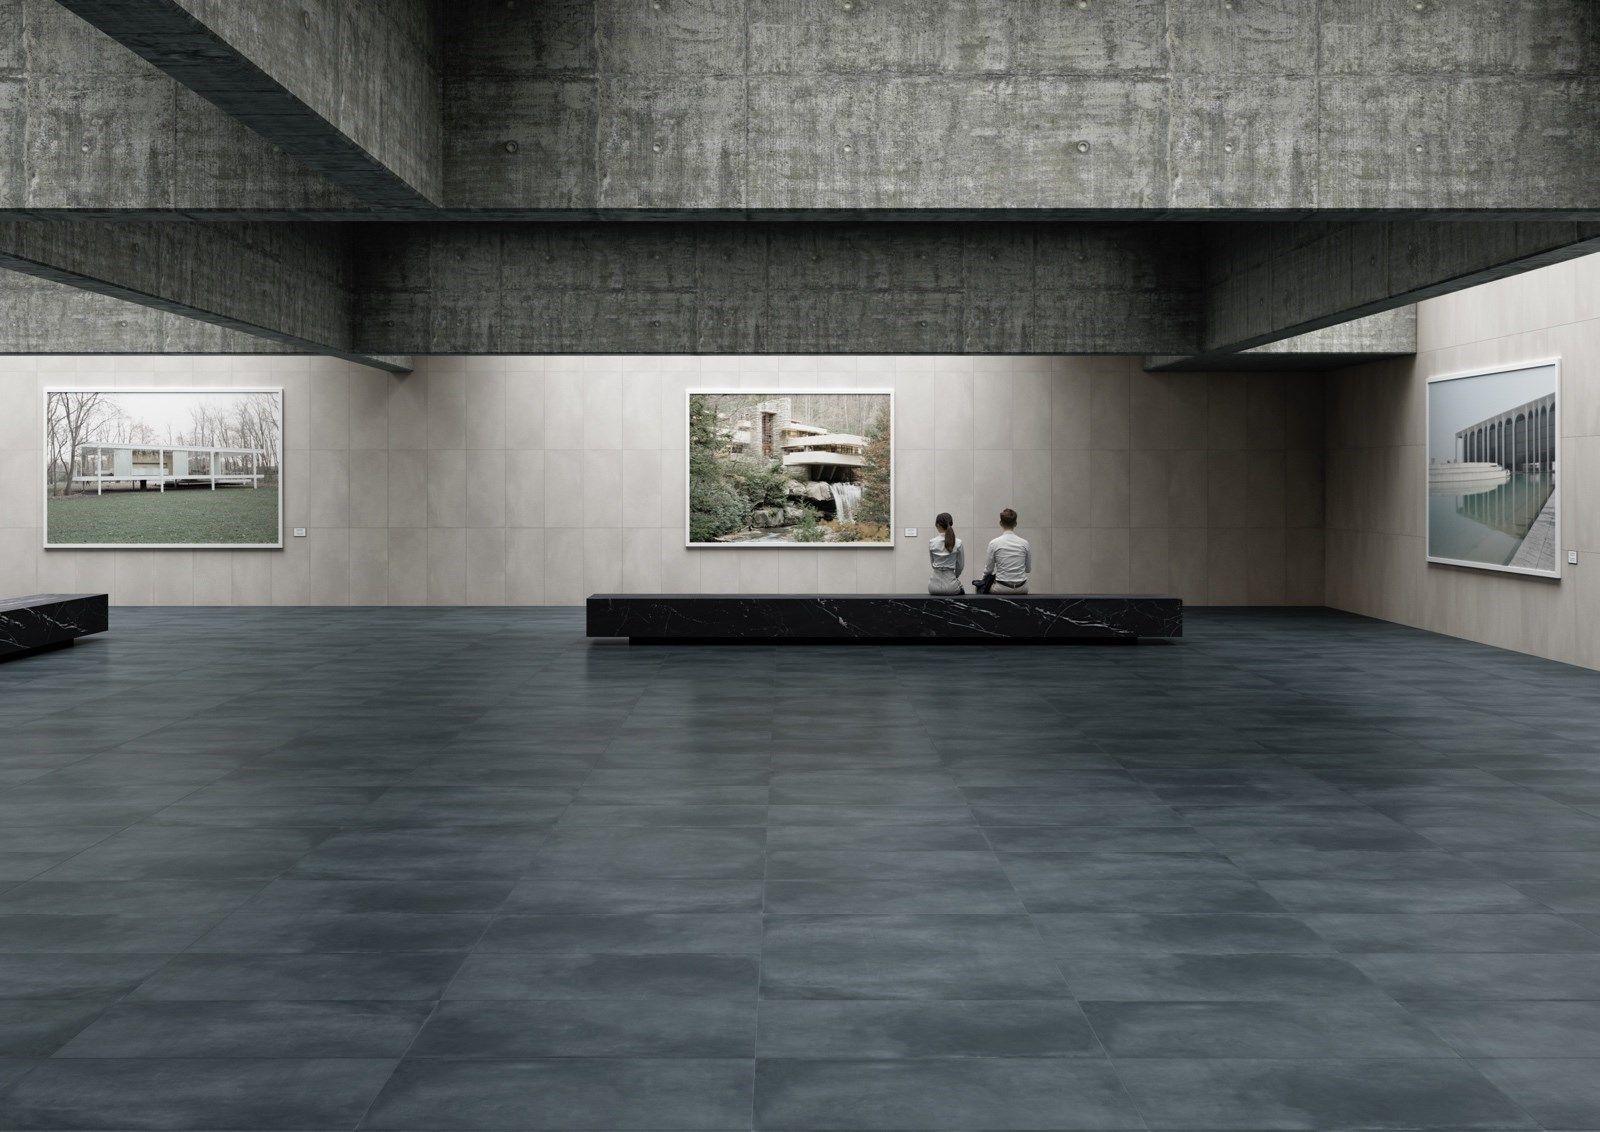 Prix Cheminee Exterieur Feu Chic Design urban chic stylecasalgrande padana